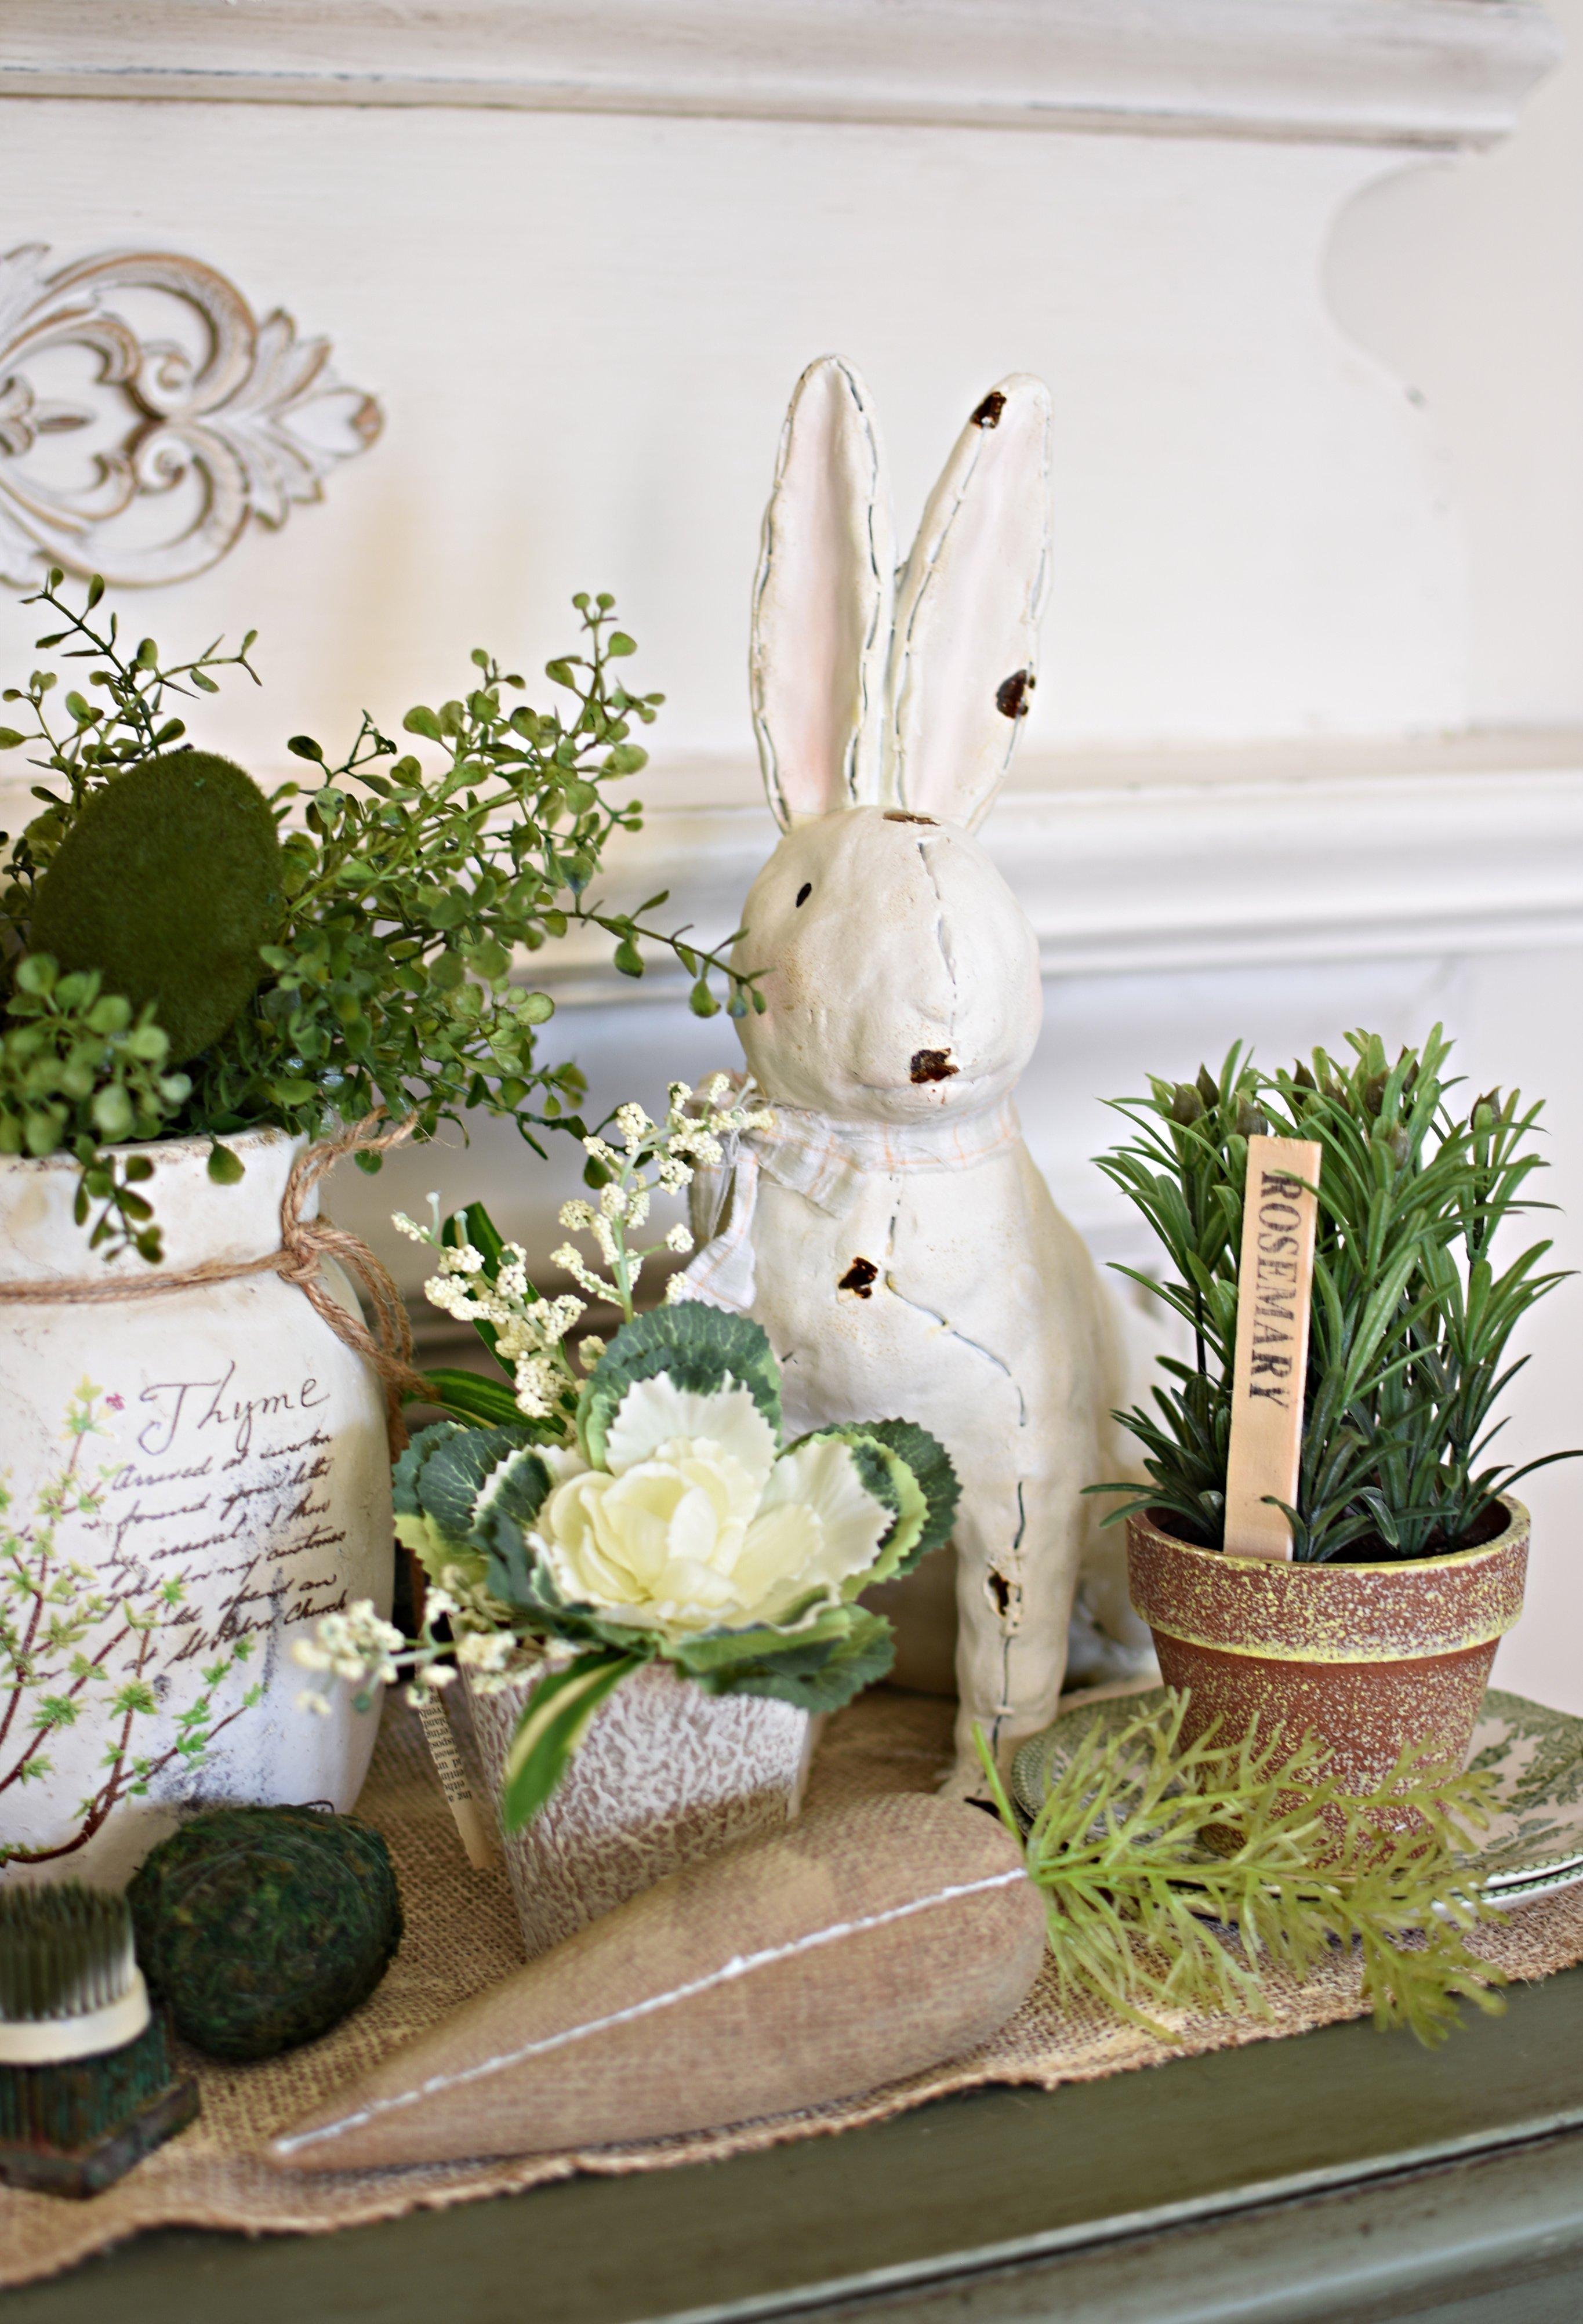 Cute Spring Vignette garden style spring decor herbs bunny shabby chic Easter